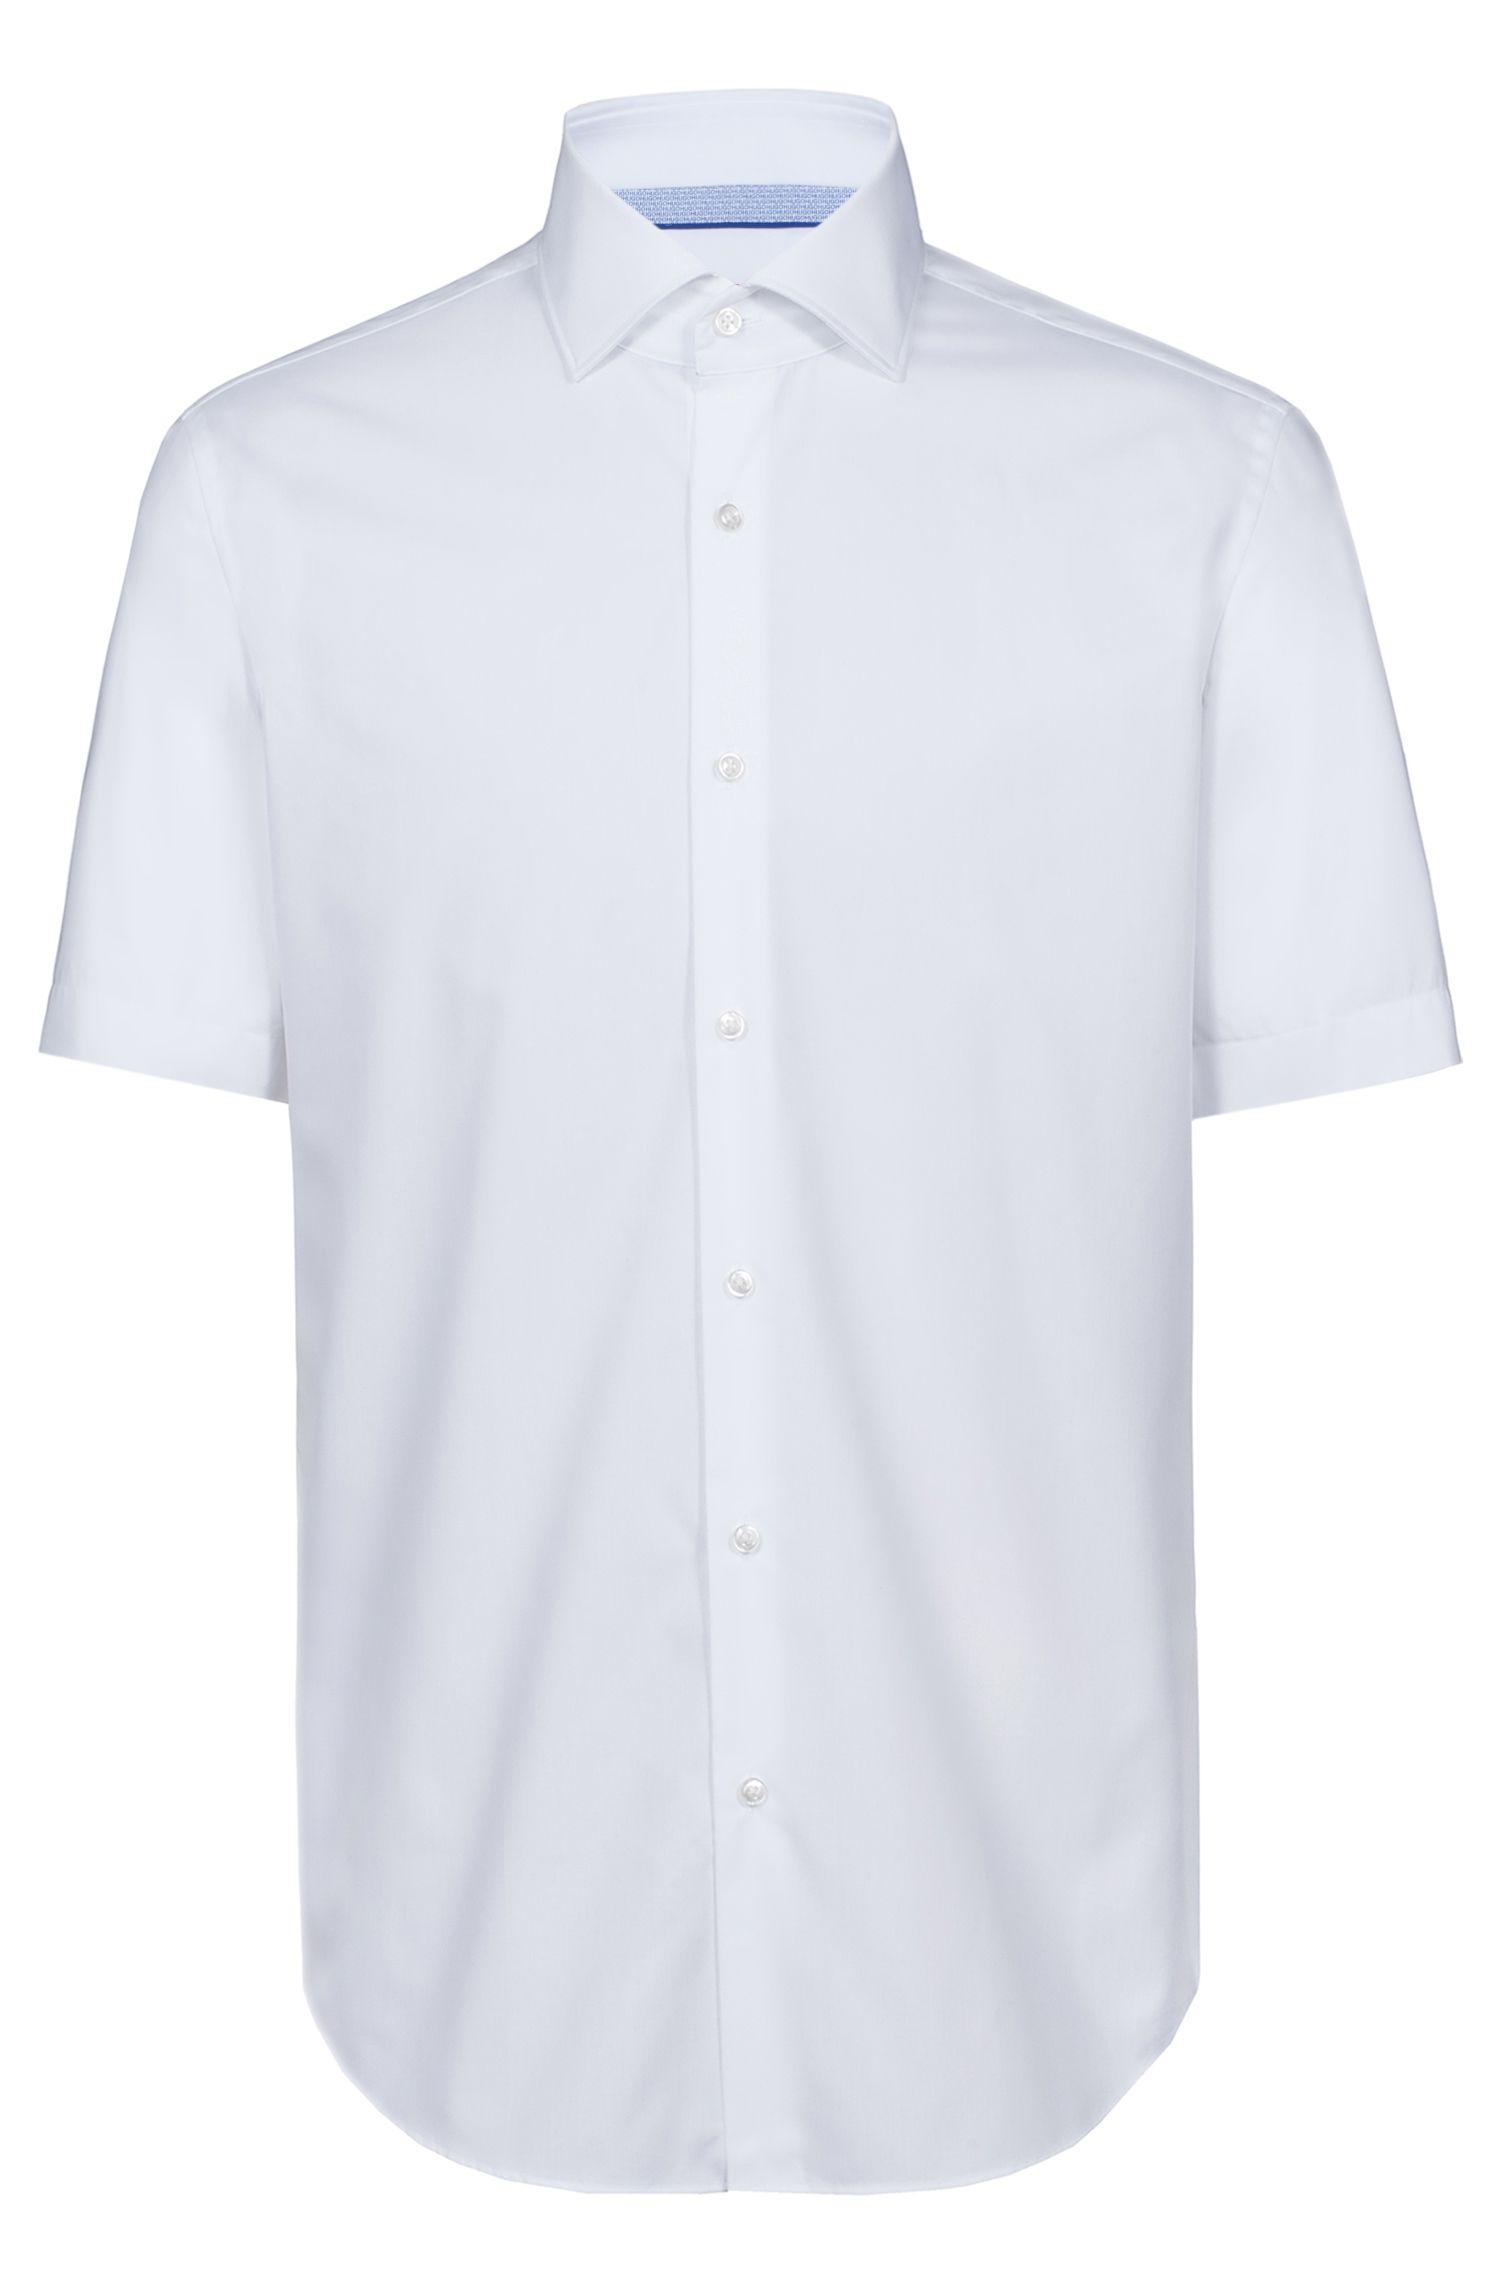 Hugo Boss - Regular-Fit Kurzarm-Hemd aus Baumwoll-Popeline mit Cutaway-Kragen - 1